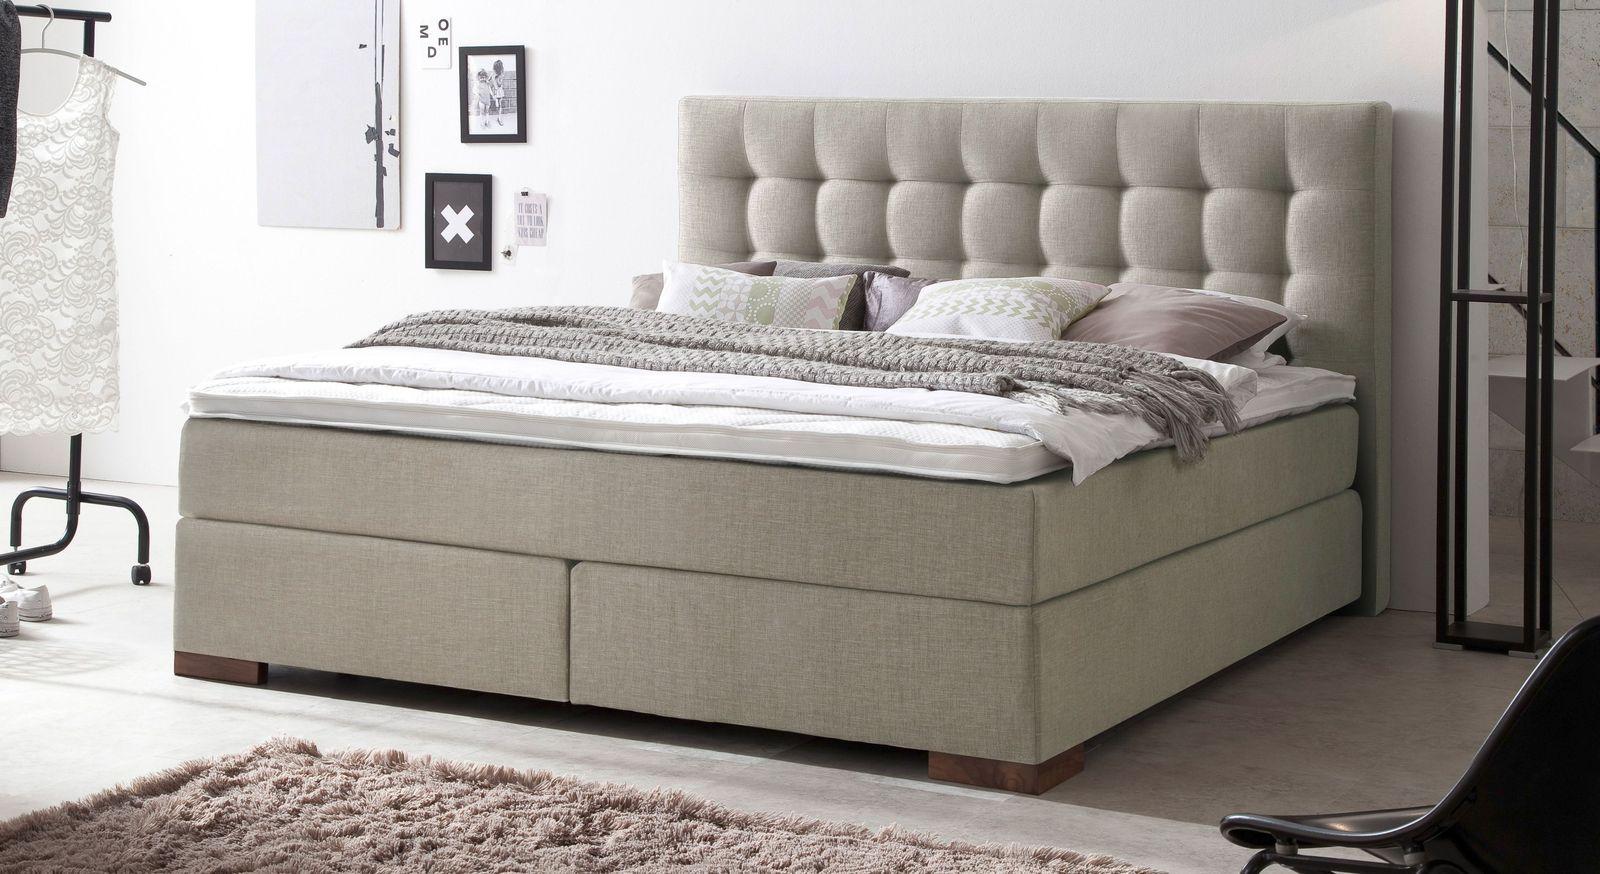 boxspringbett in z b 160x200 cm in h2 bis h5 g nstig arlon. Black Bedroom Furniture Sets. Home Design Ideas